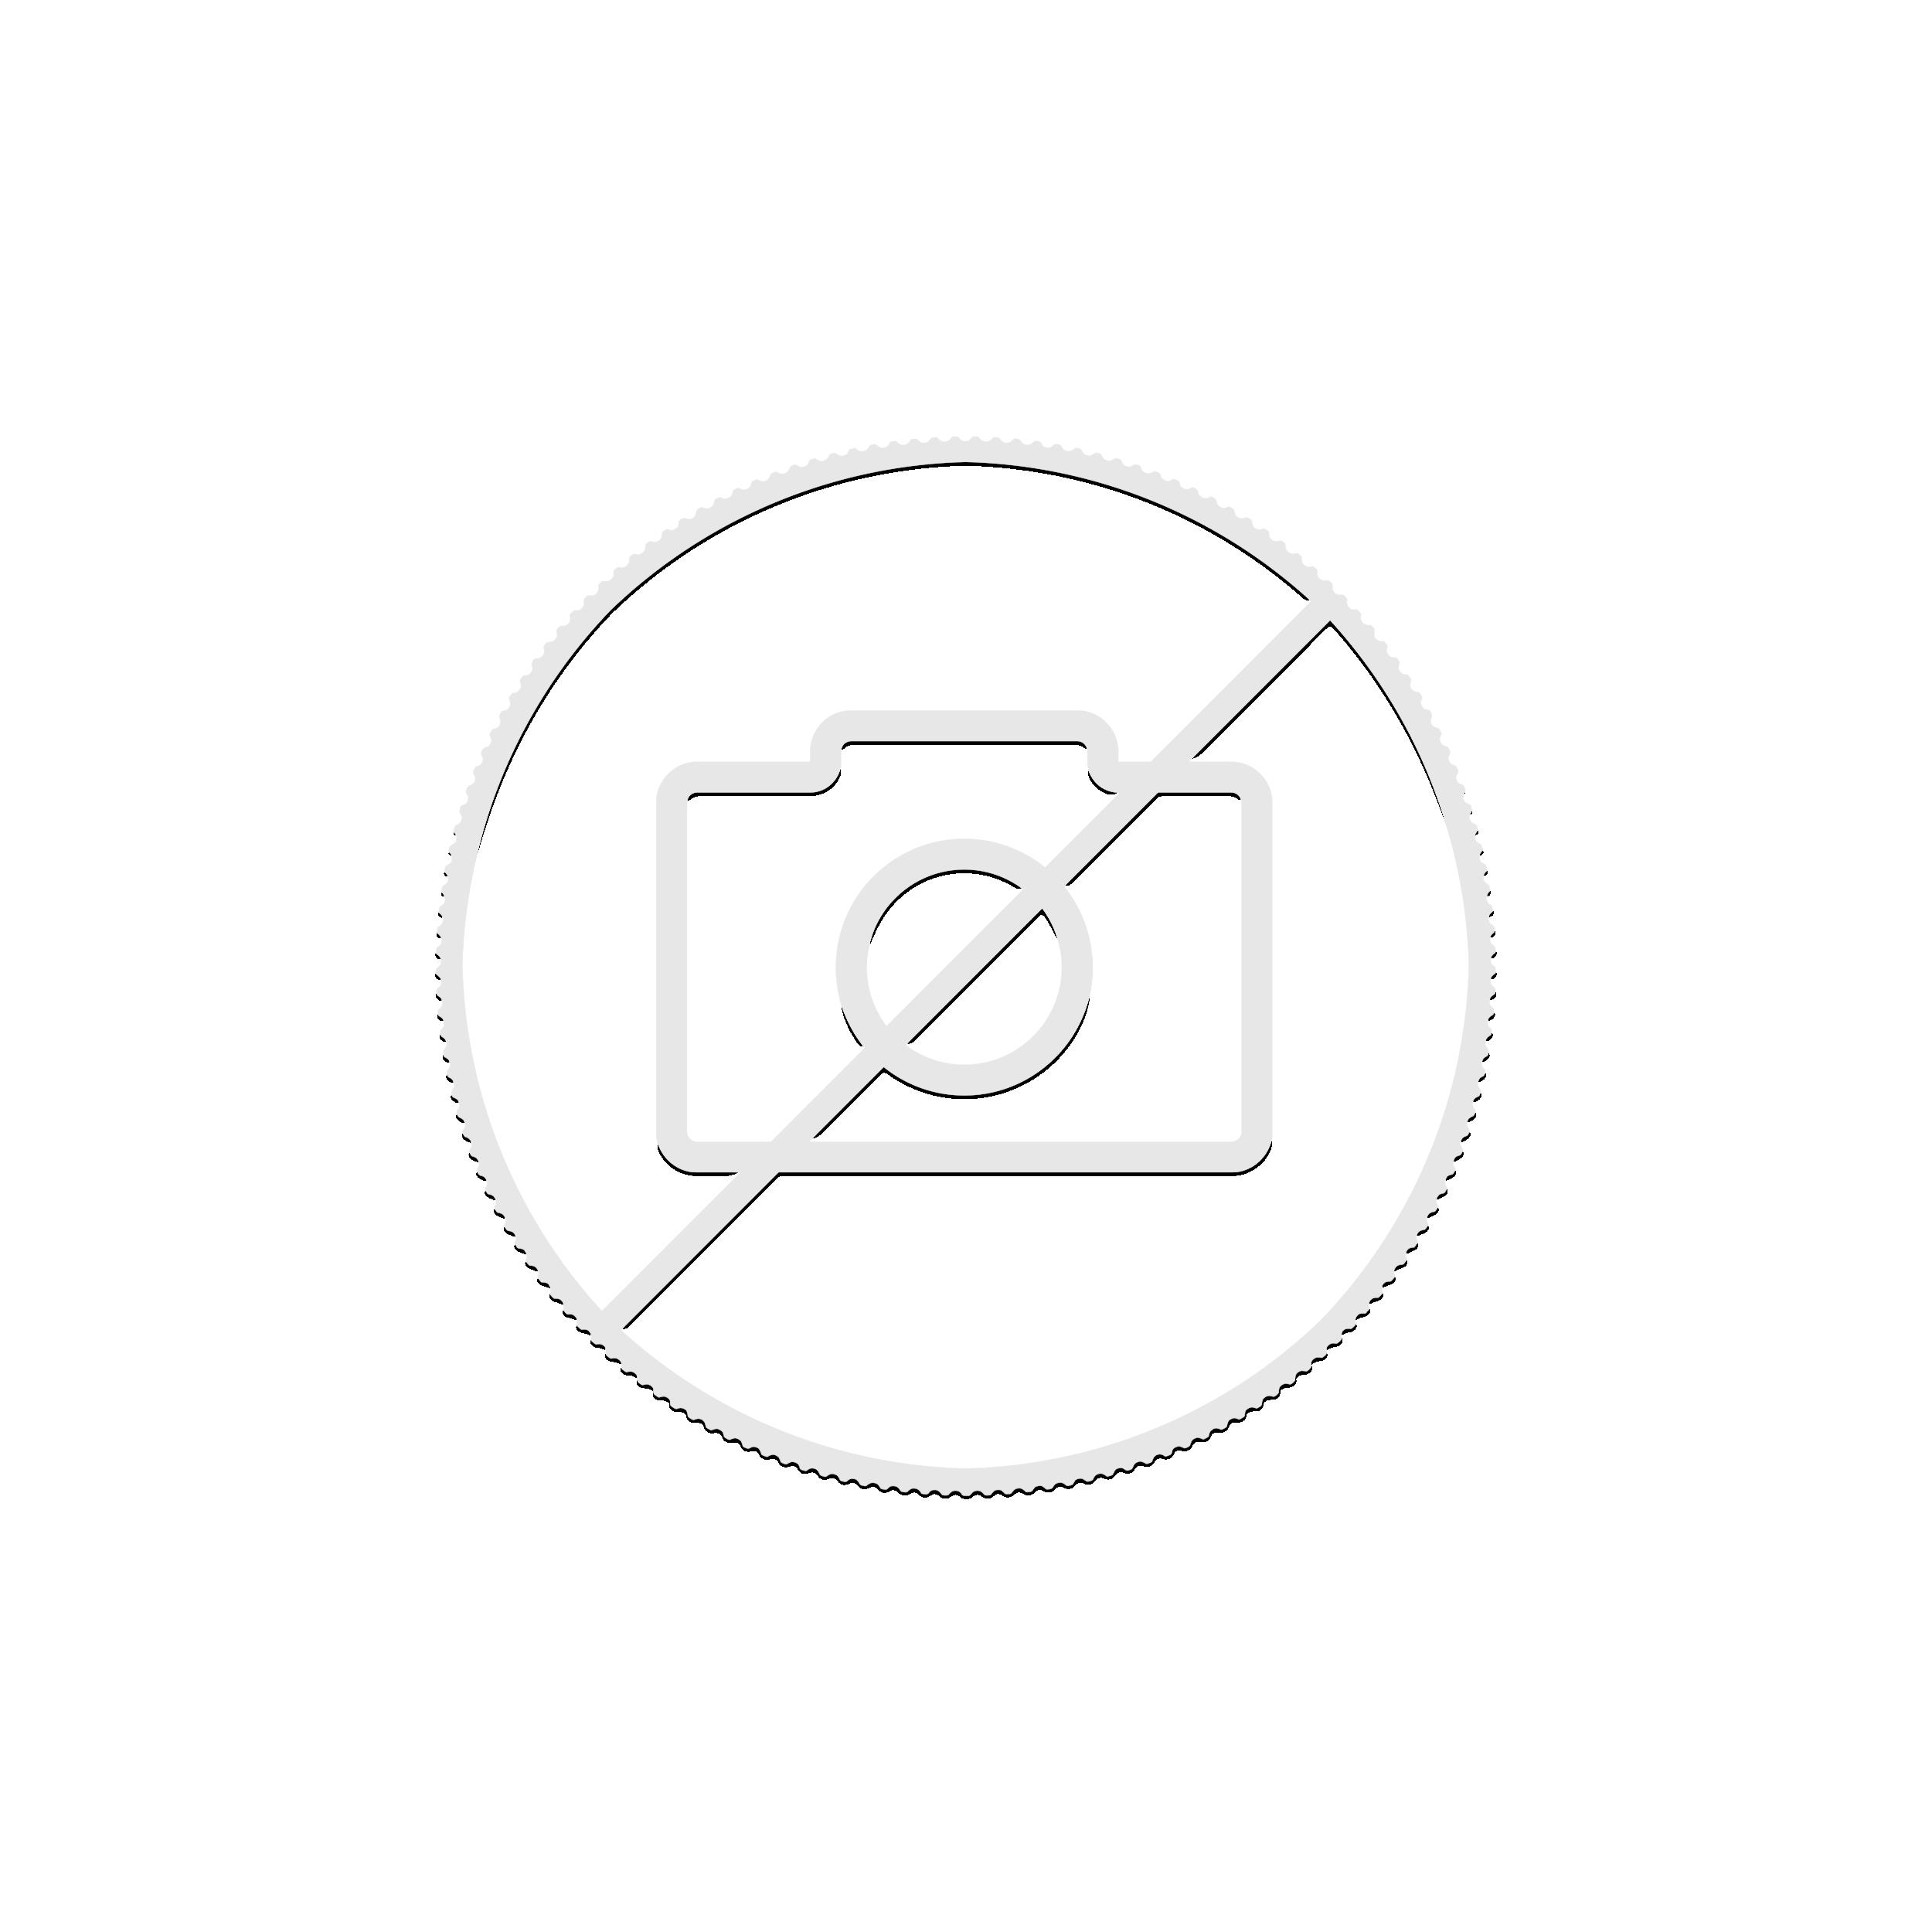 1 troy ounce gouden Maple Leaf munt Assay Card 2016